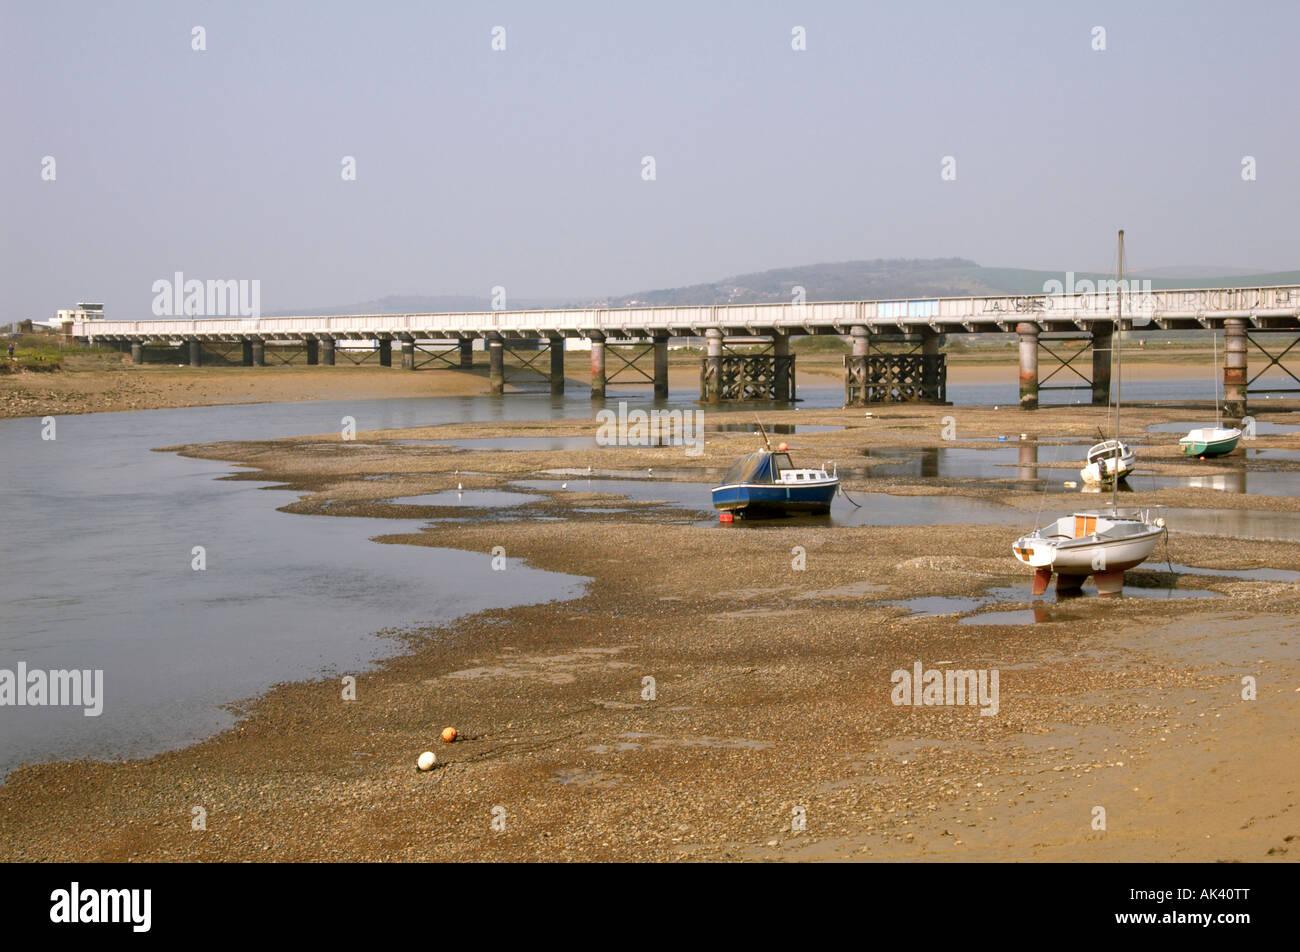 The river Adur, shoreham. Stock Photo